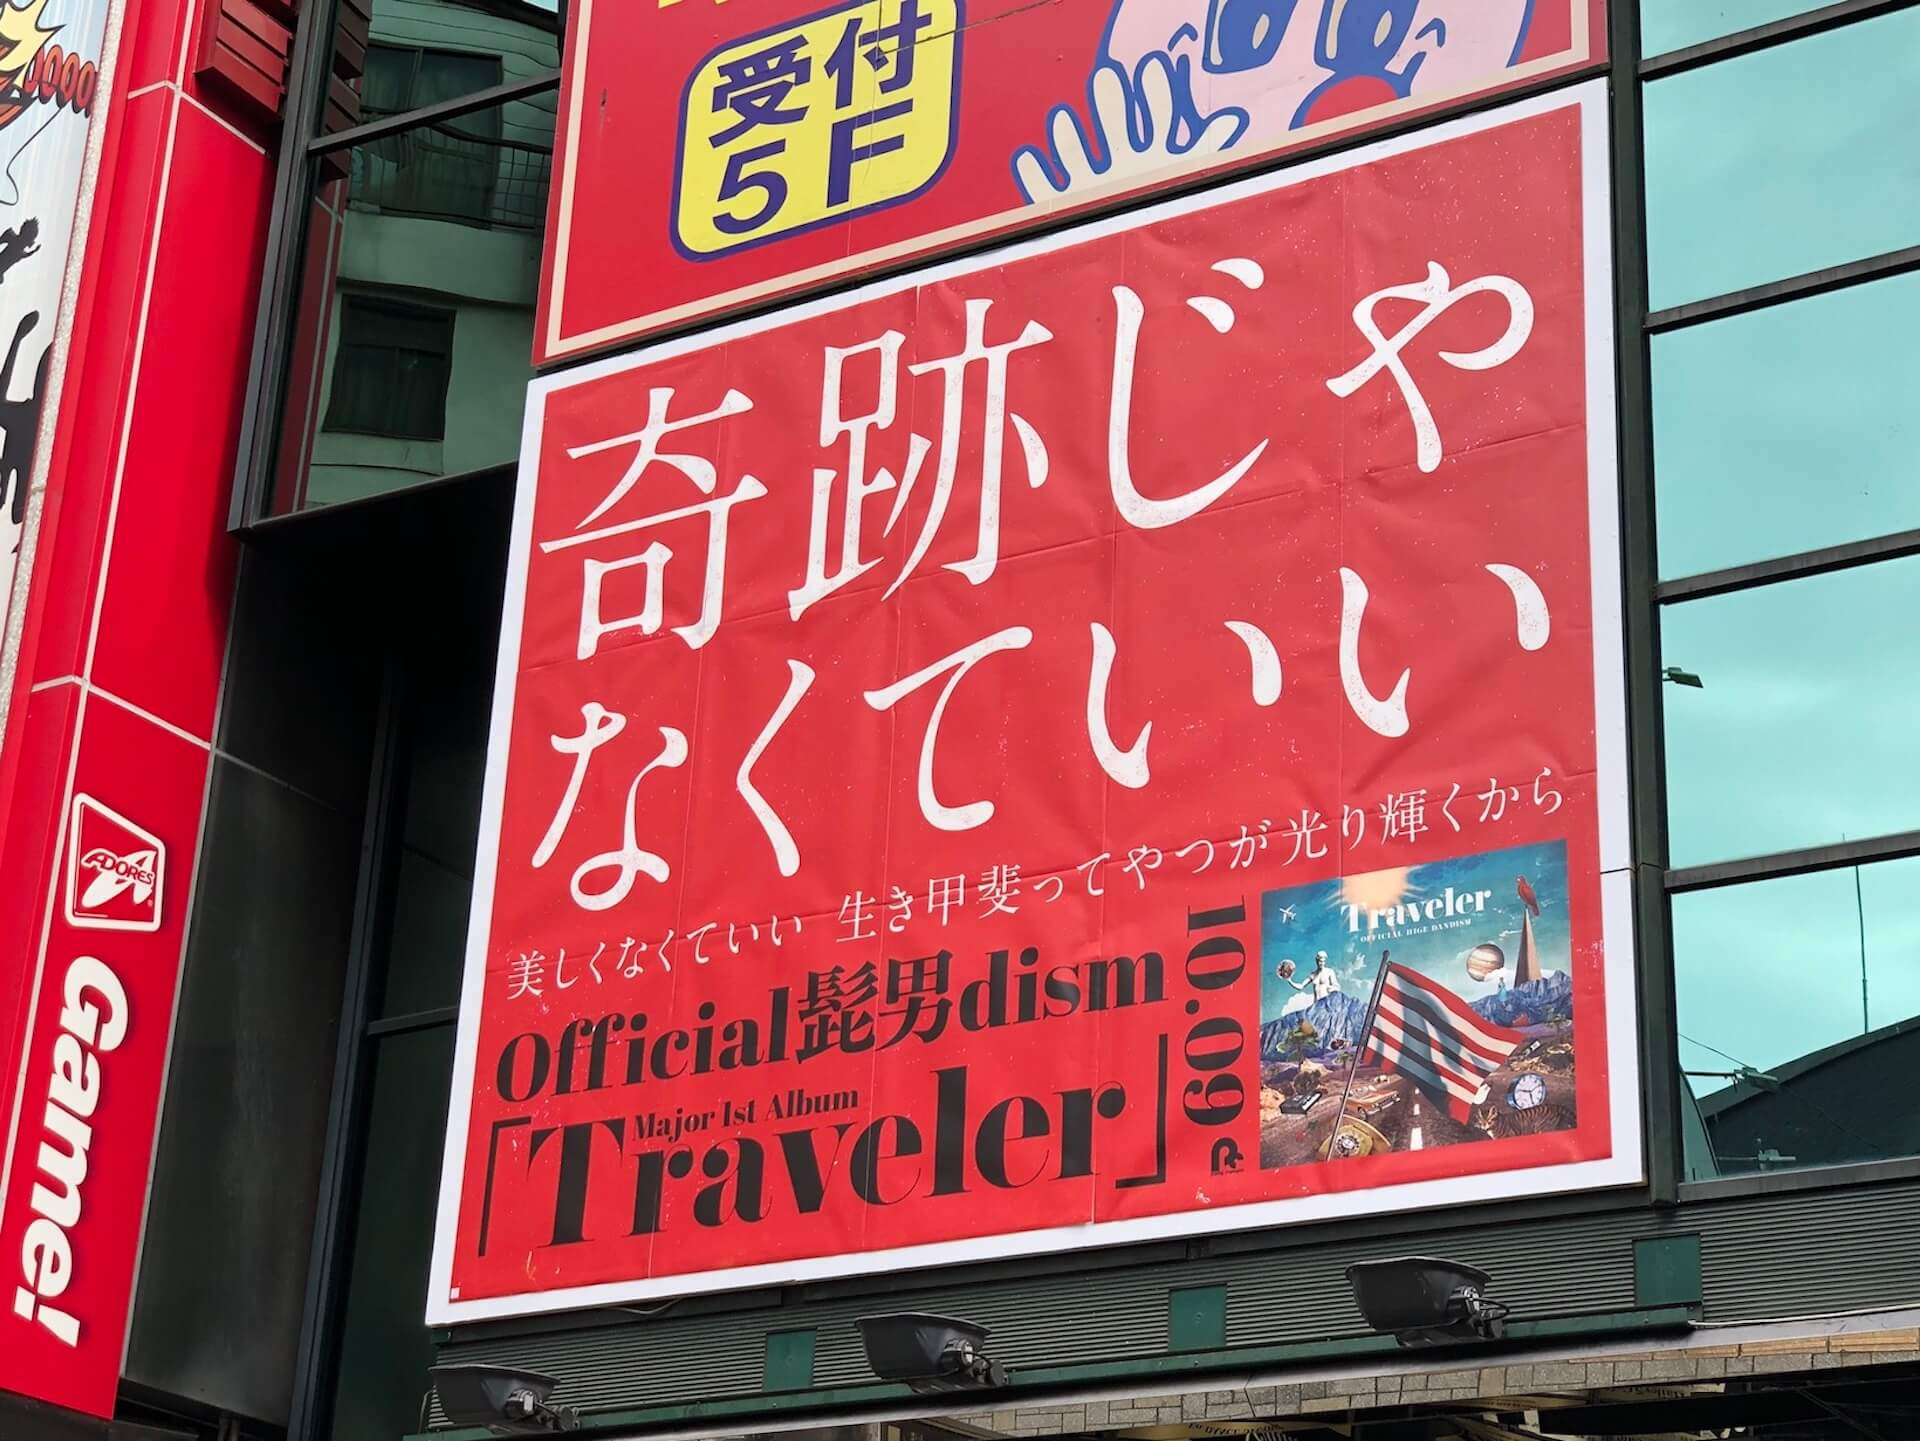 Official髭男dismが渋谷をジャック!『Traveler』発売記念、ジャックポスターが登場|渋谷某所で未発表曲の解禁も music191007_higedan_3